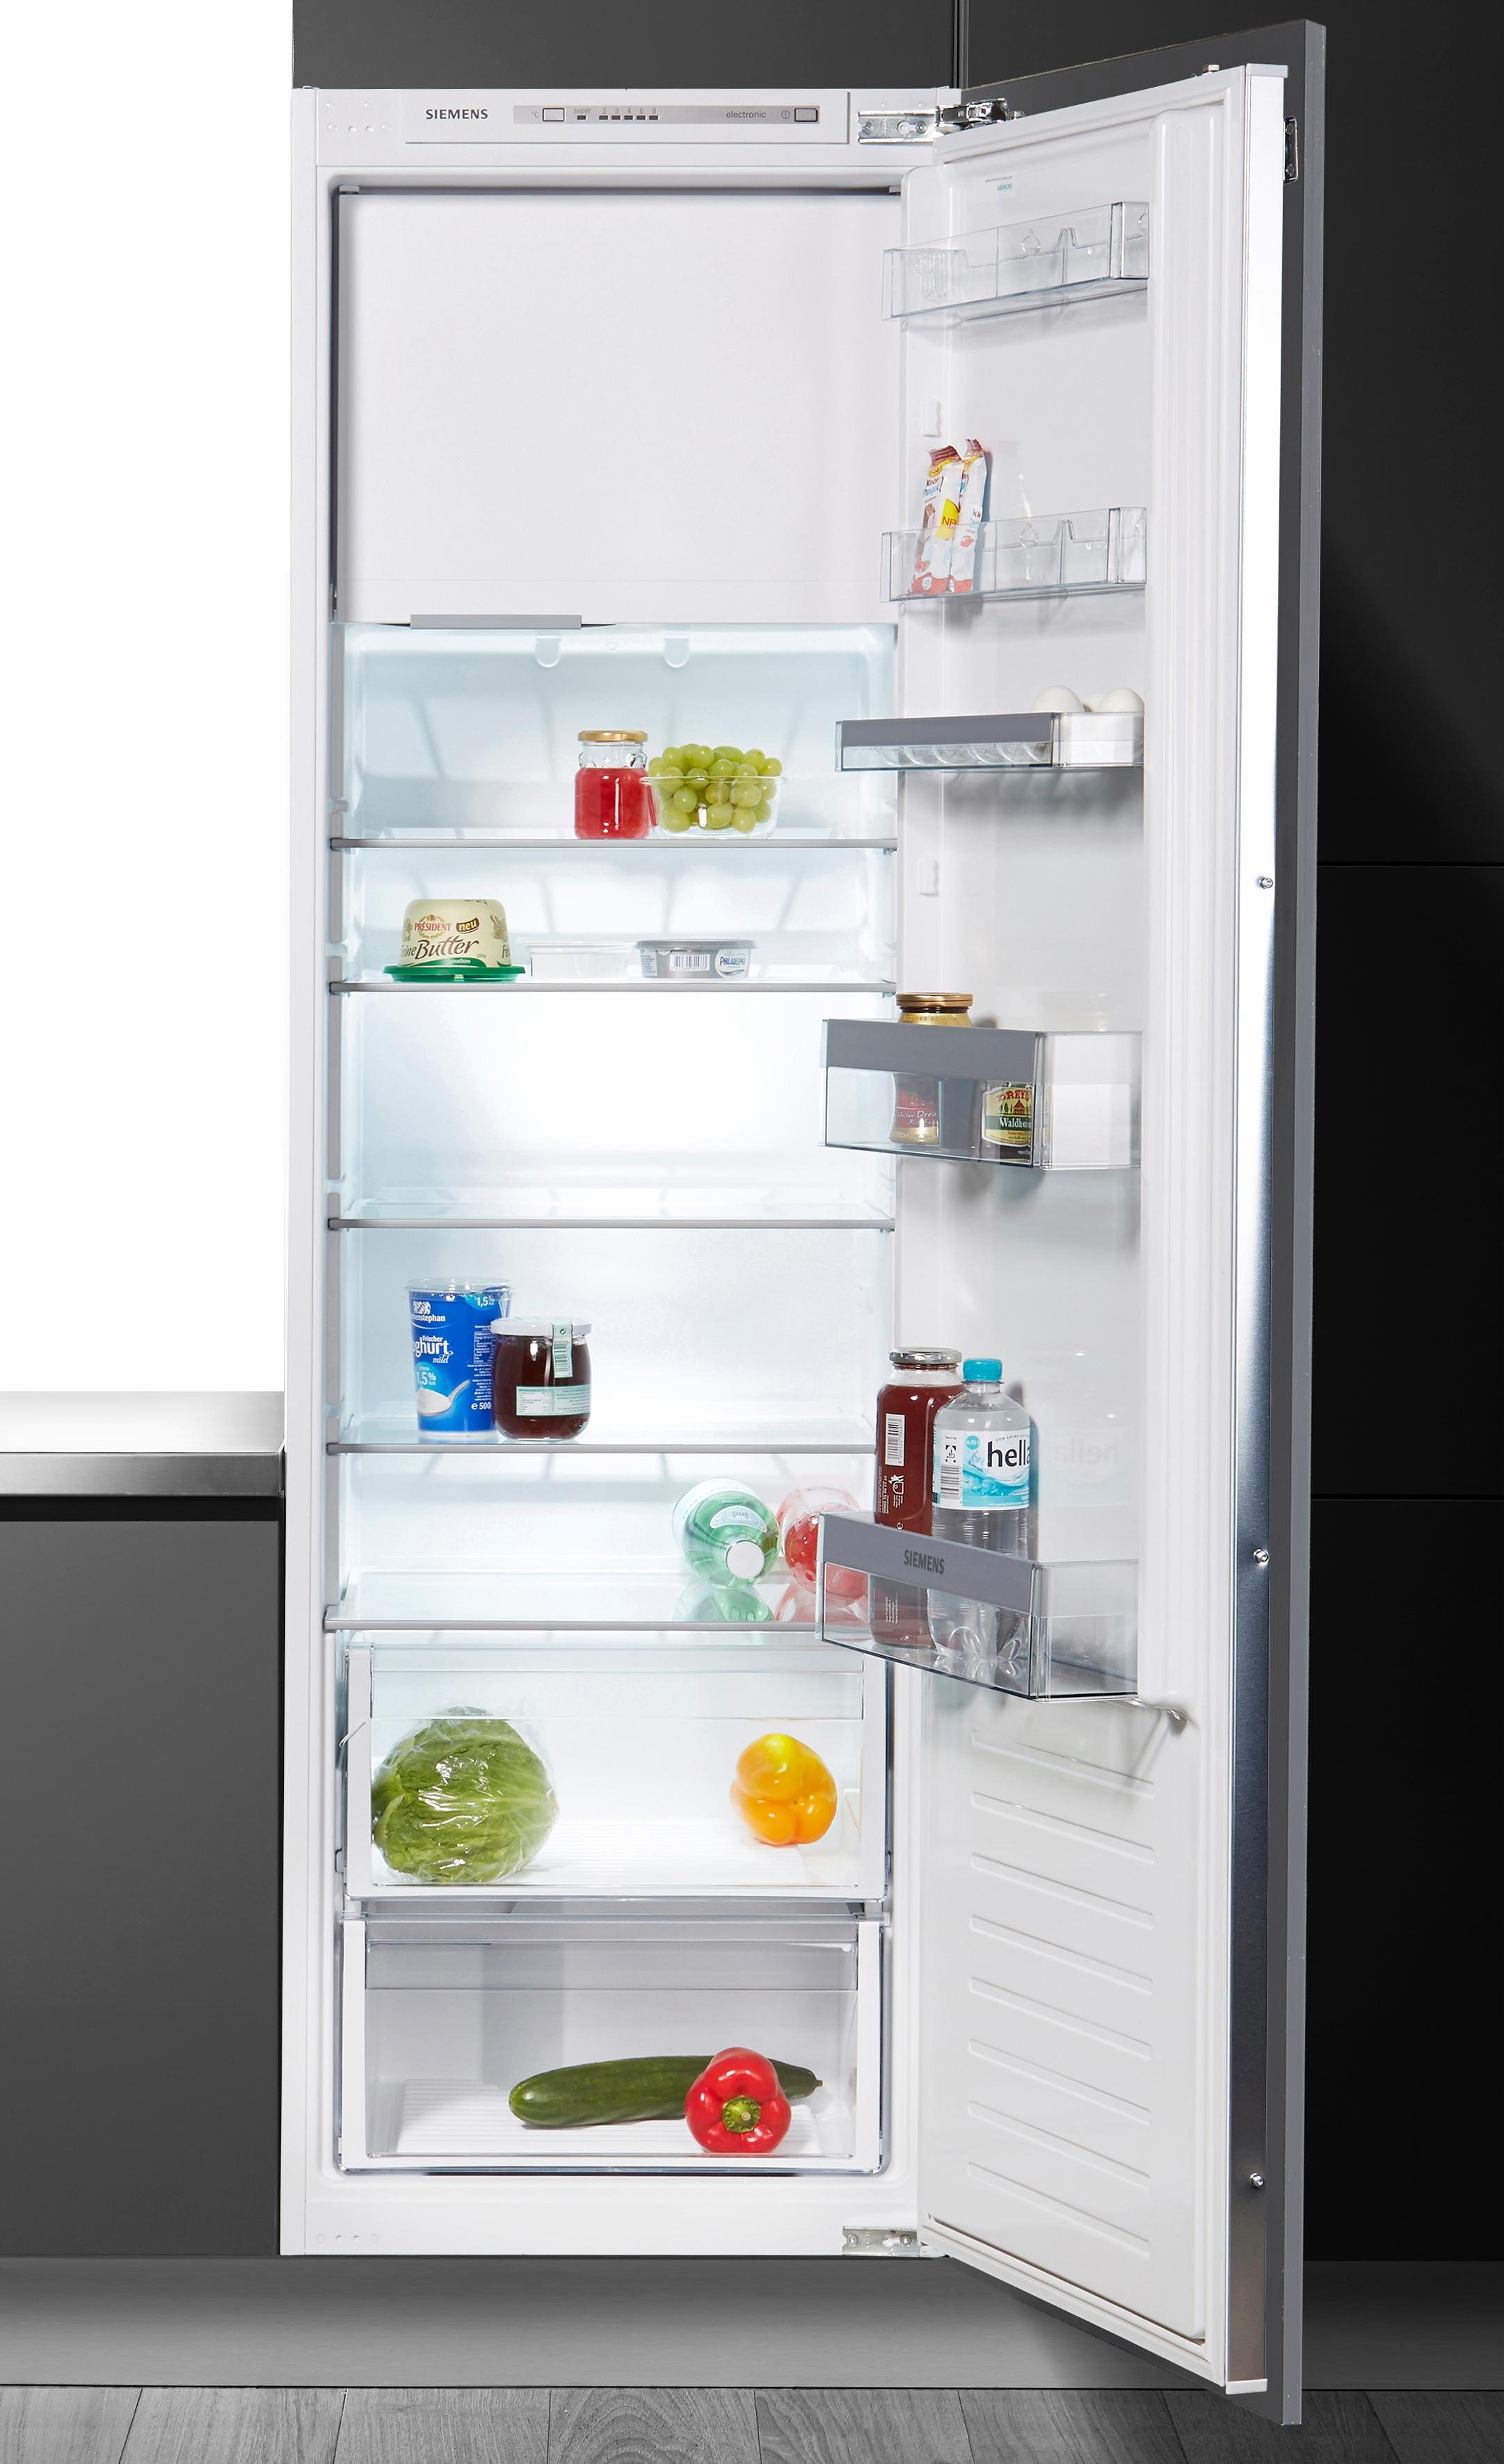 Siemens Einbau-Kühlautomat KI82LVF30, Energieklasse A++, hyperFresh